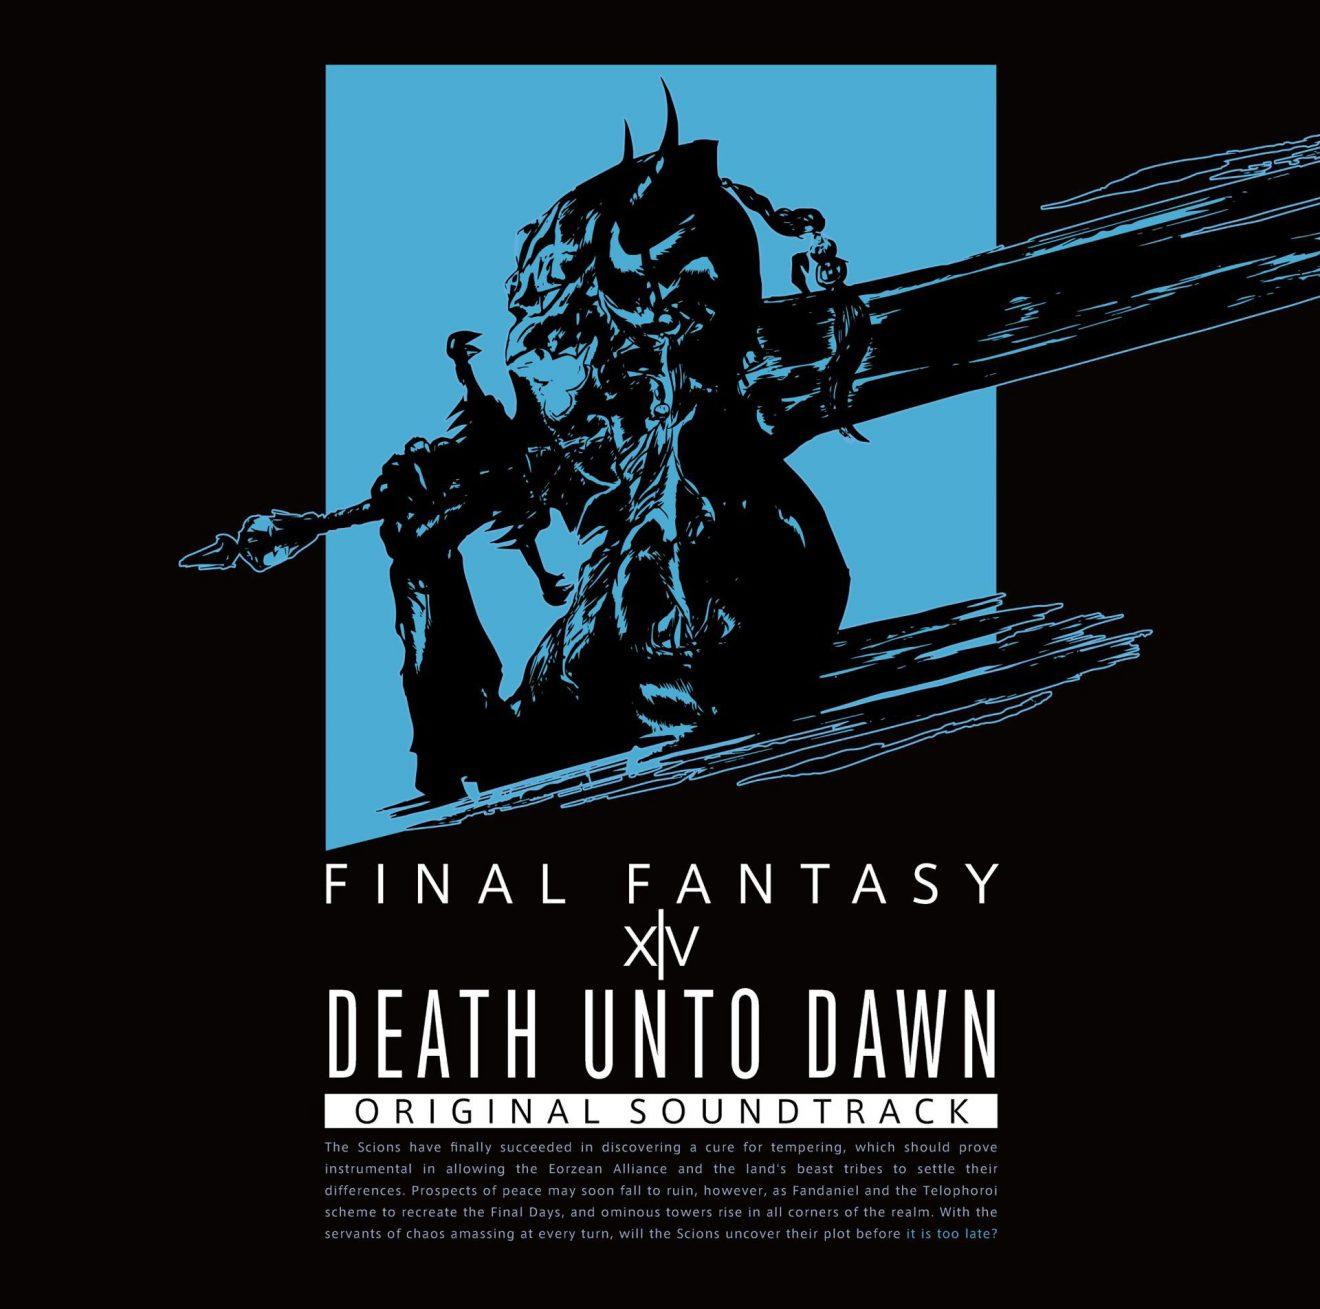 deathuntodawn